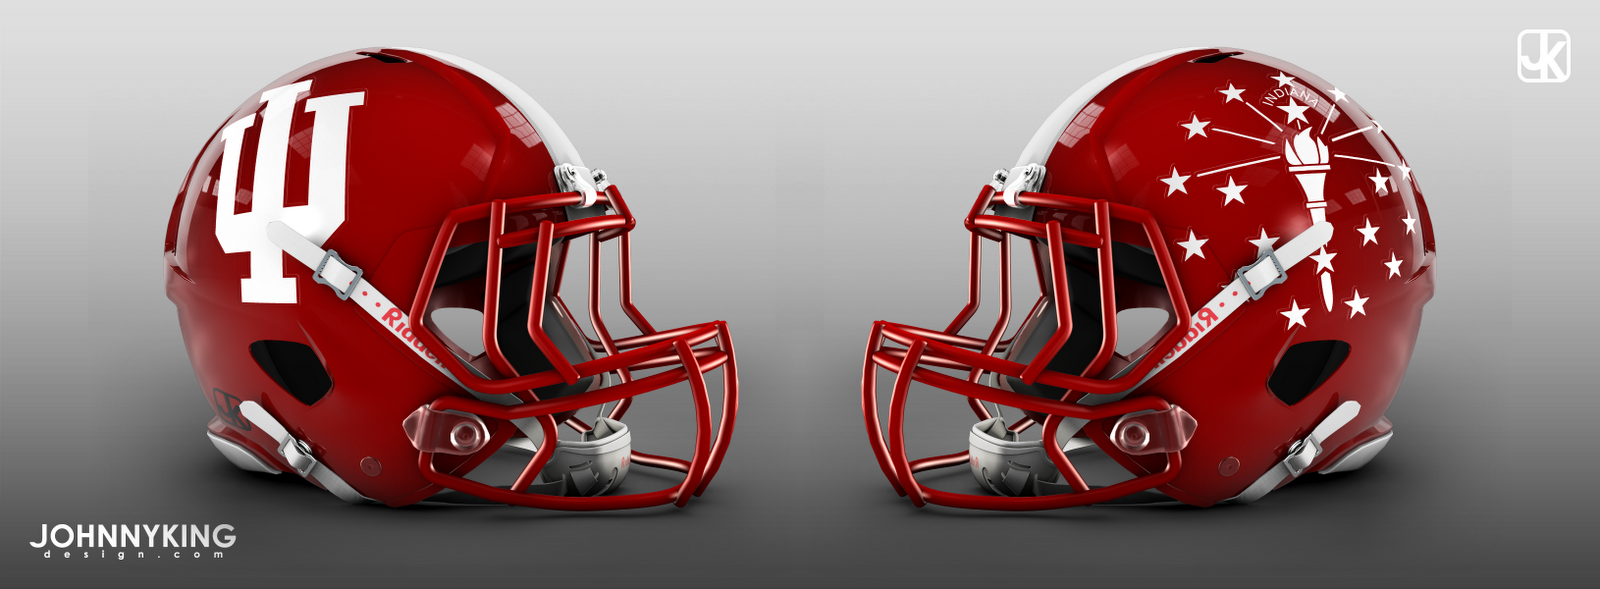 Johnny King Design: My Concept Indiana University Football ...